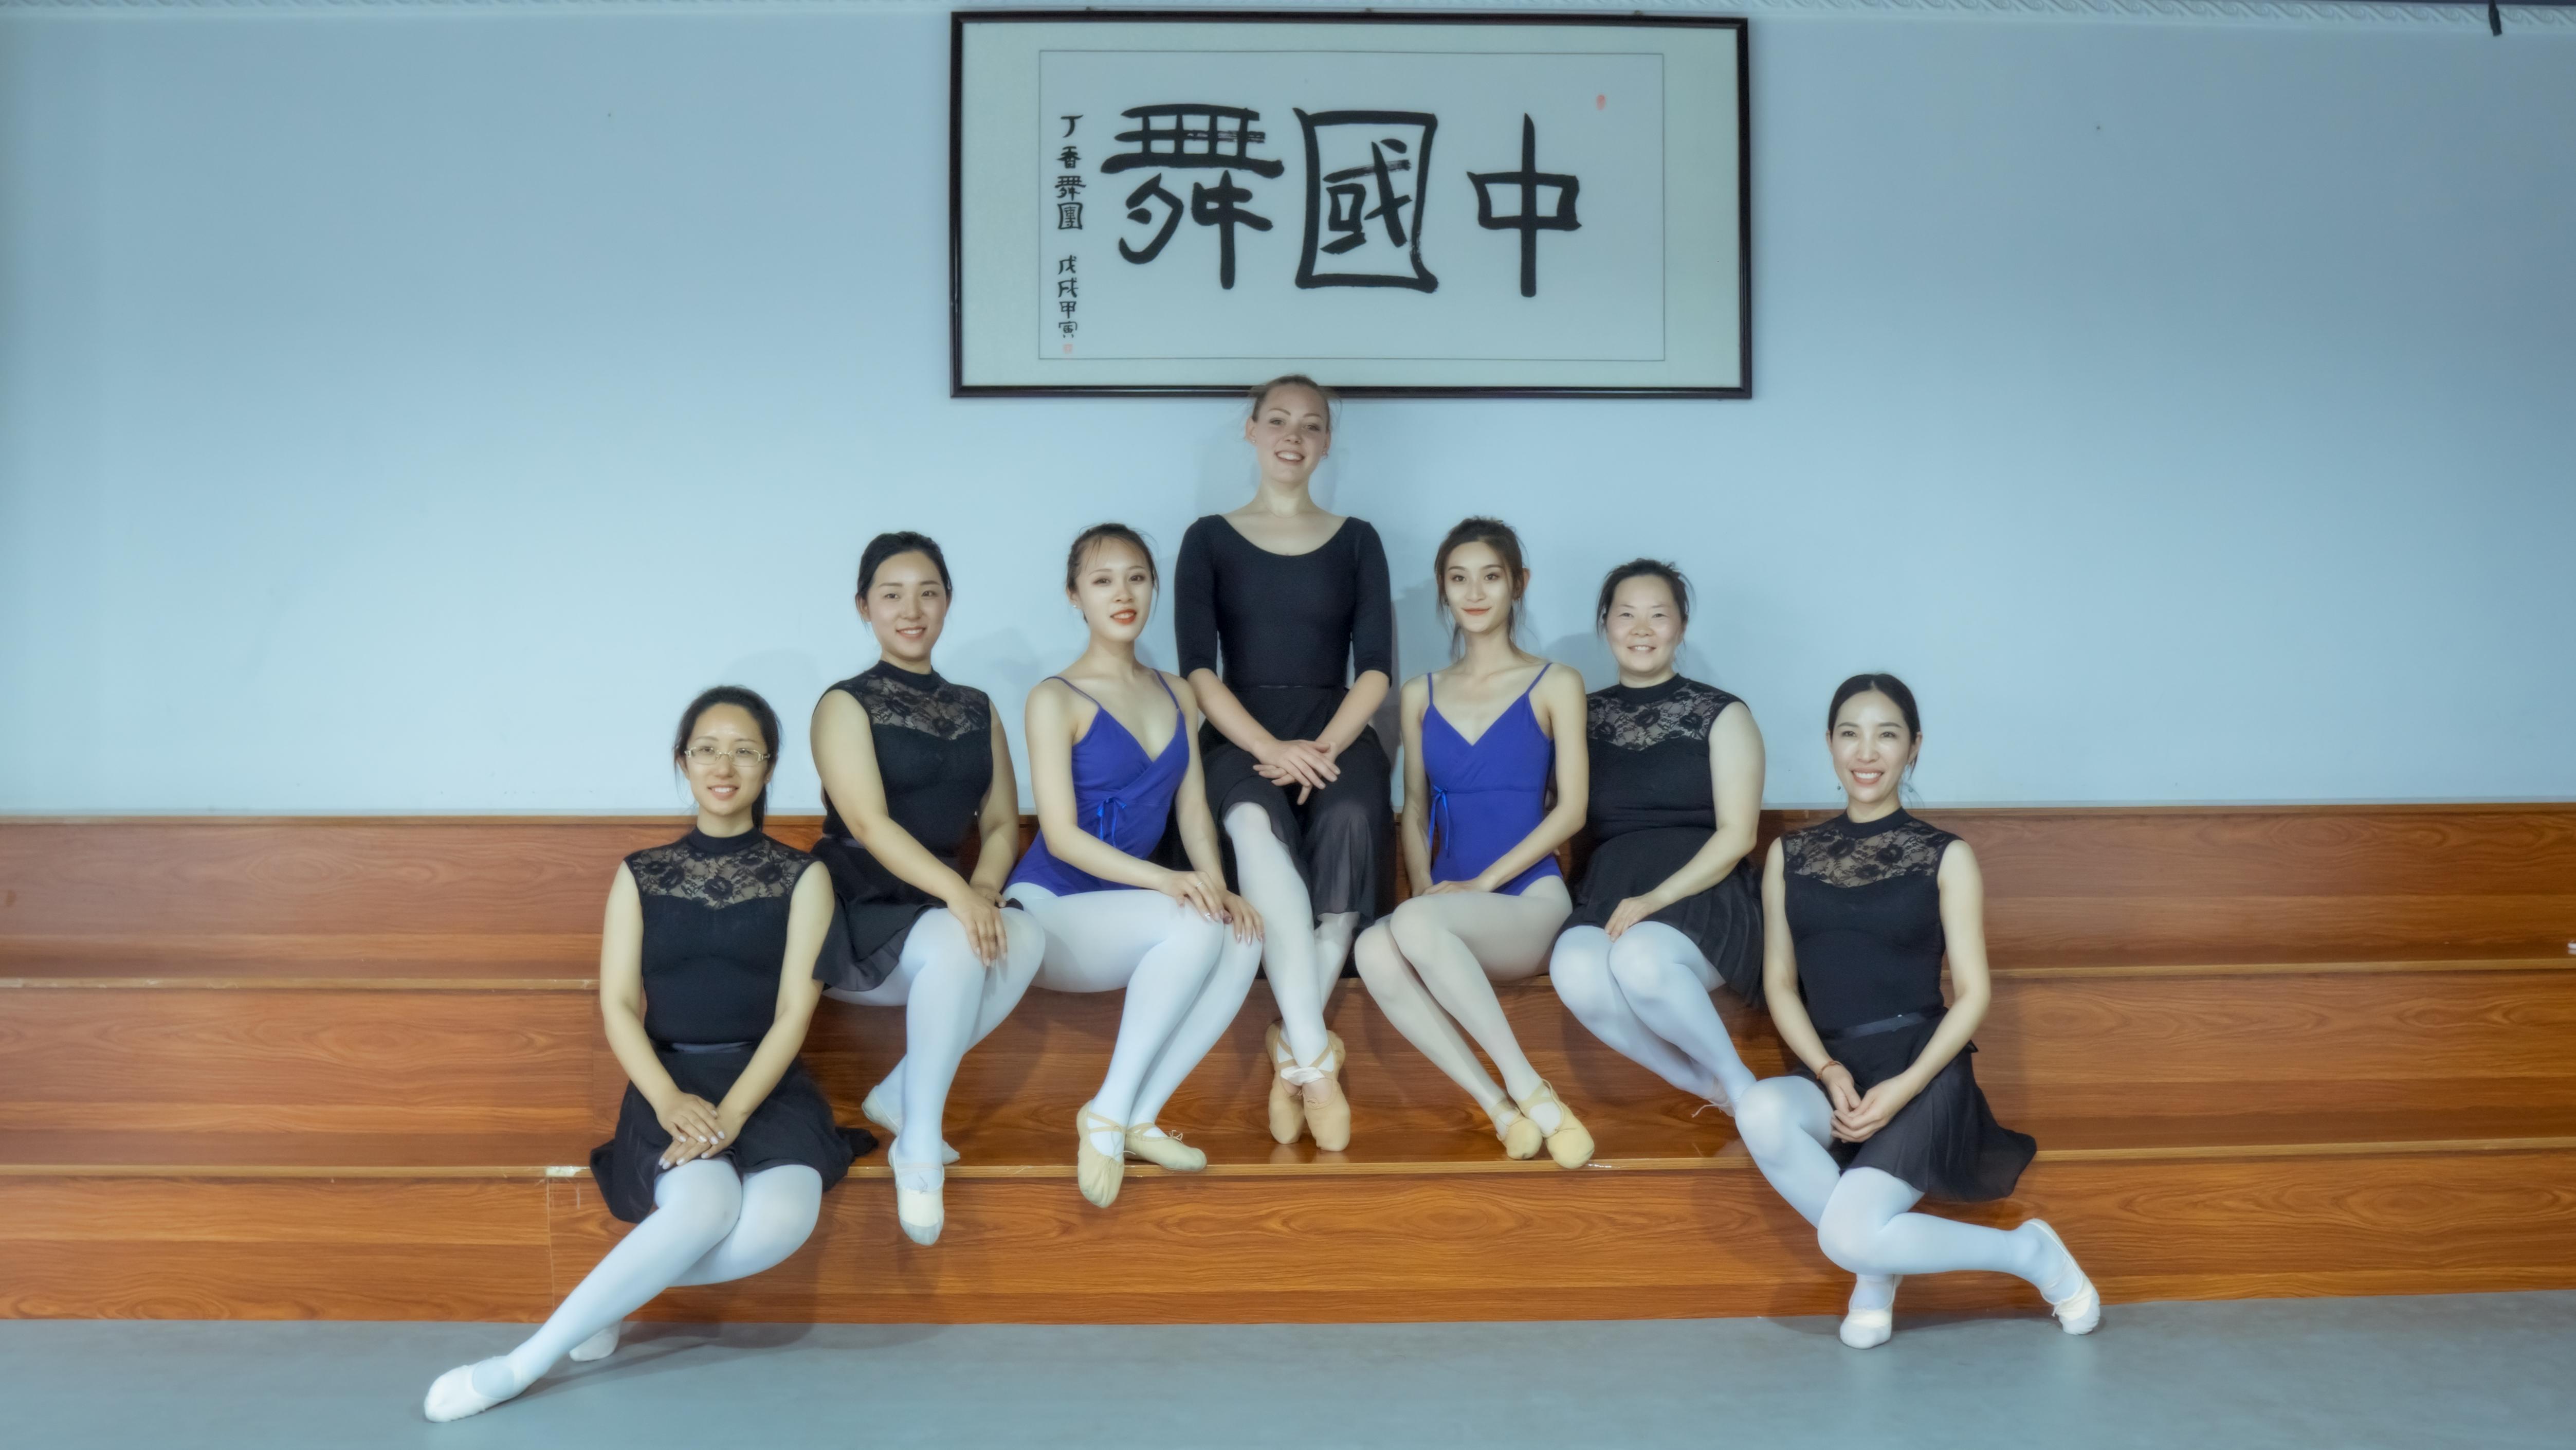 Loura Sita van Krimpen teaching ballet in Zhengzhou China